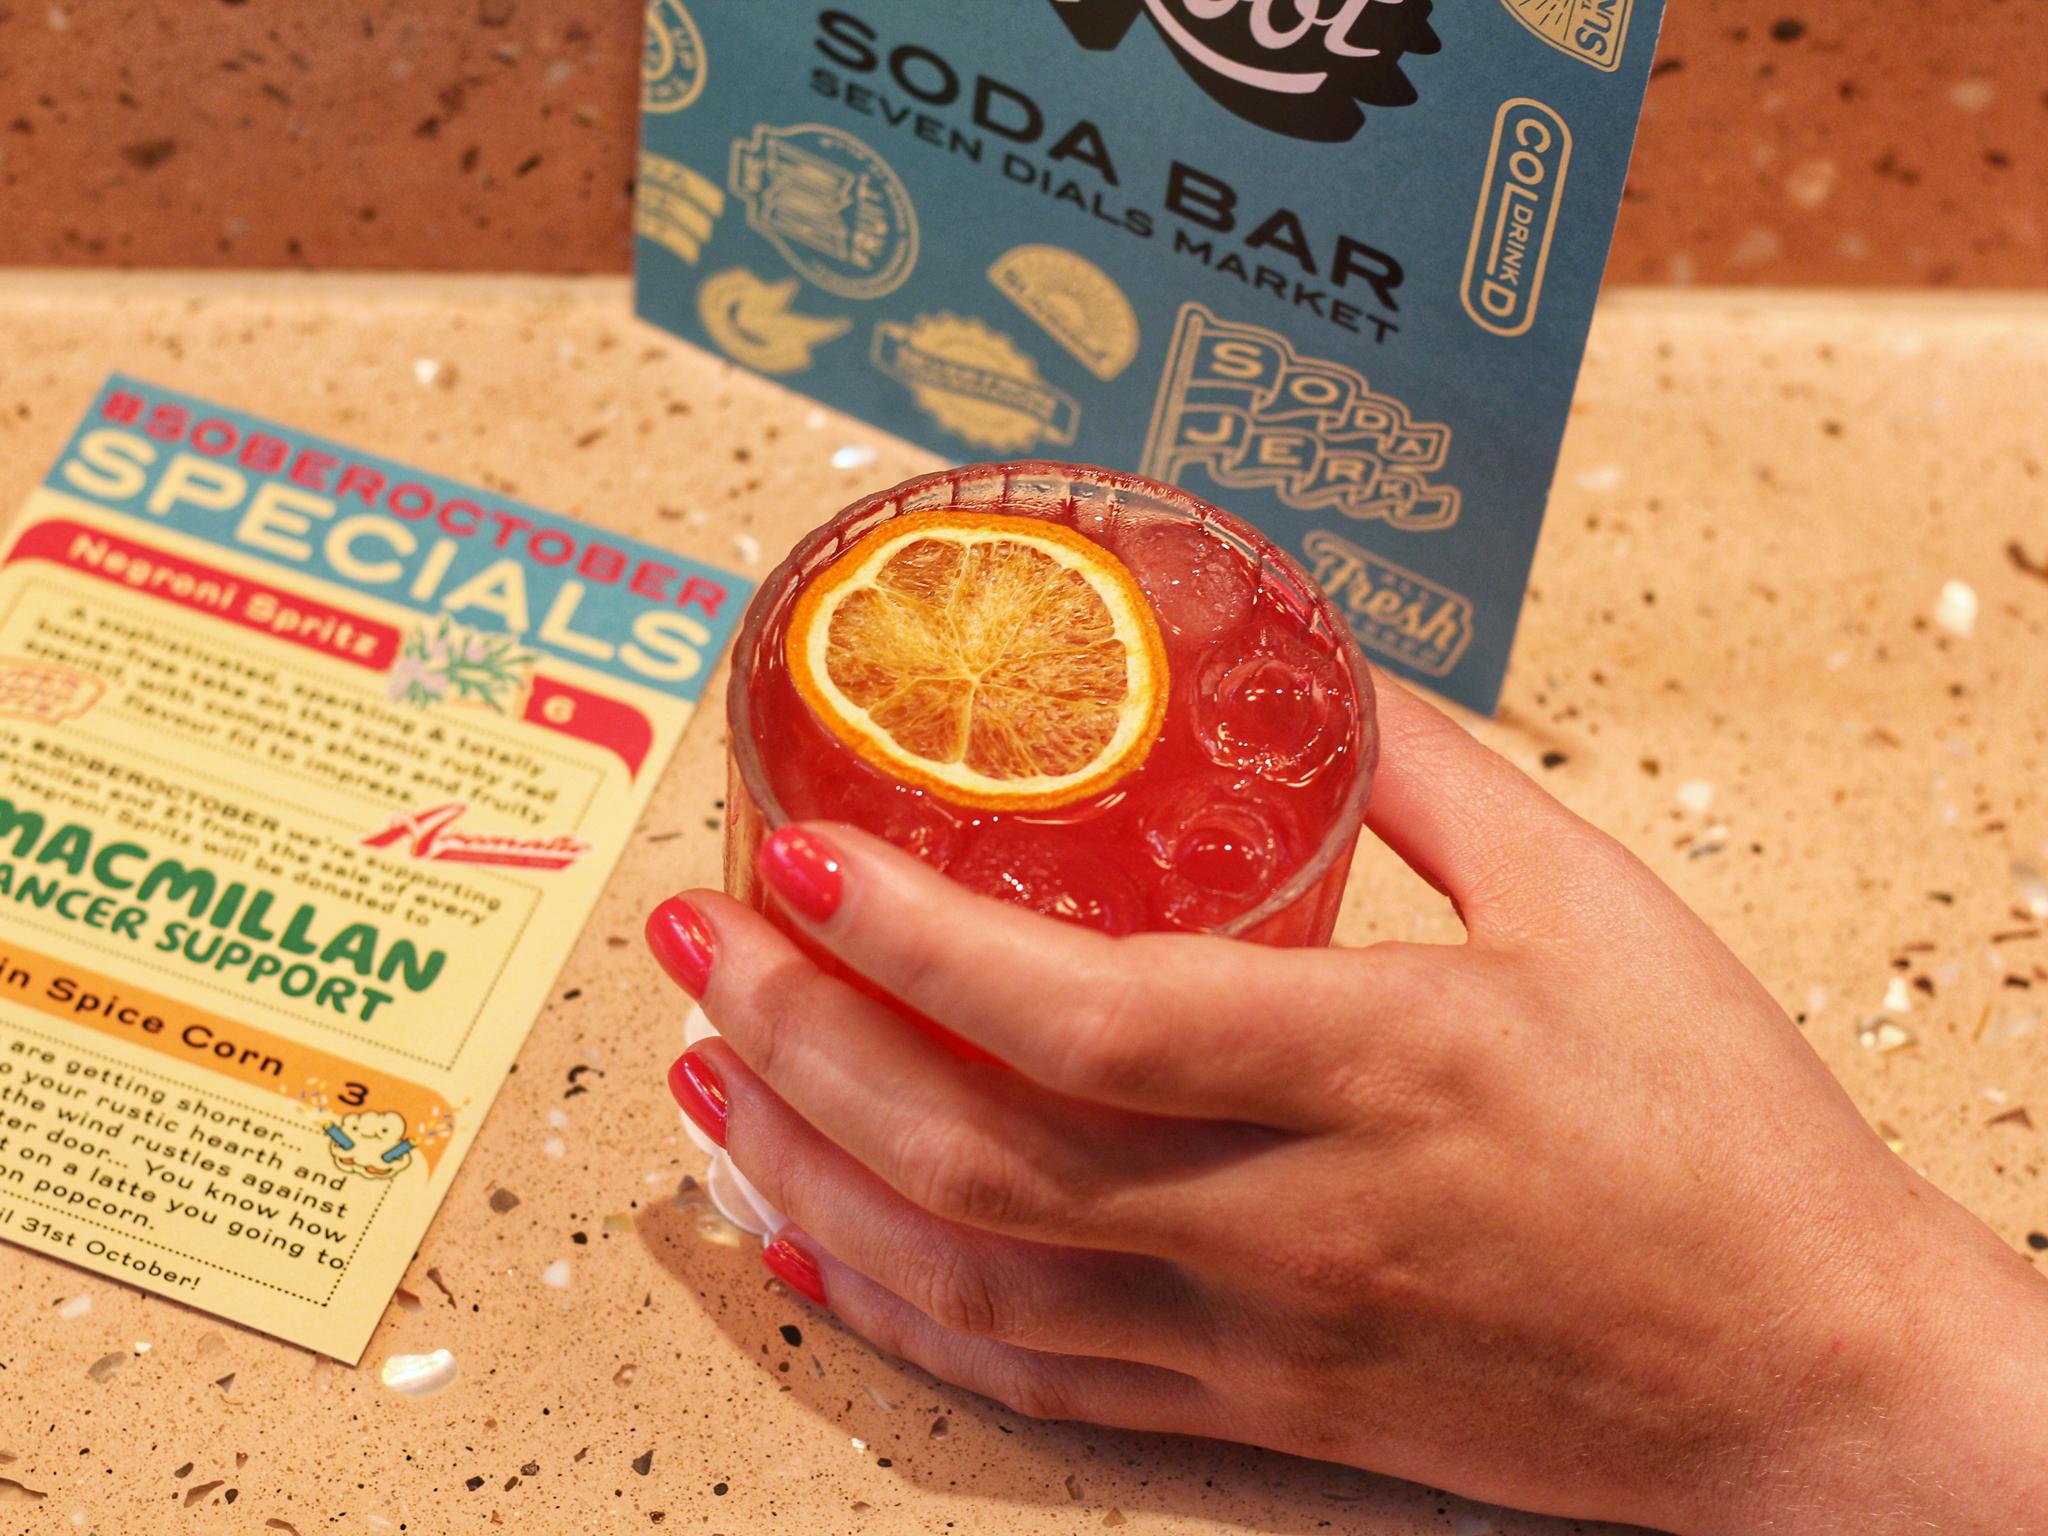 Square Root Soda Bar